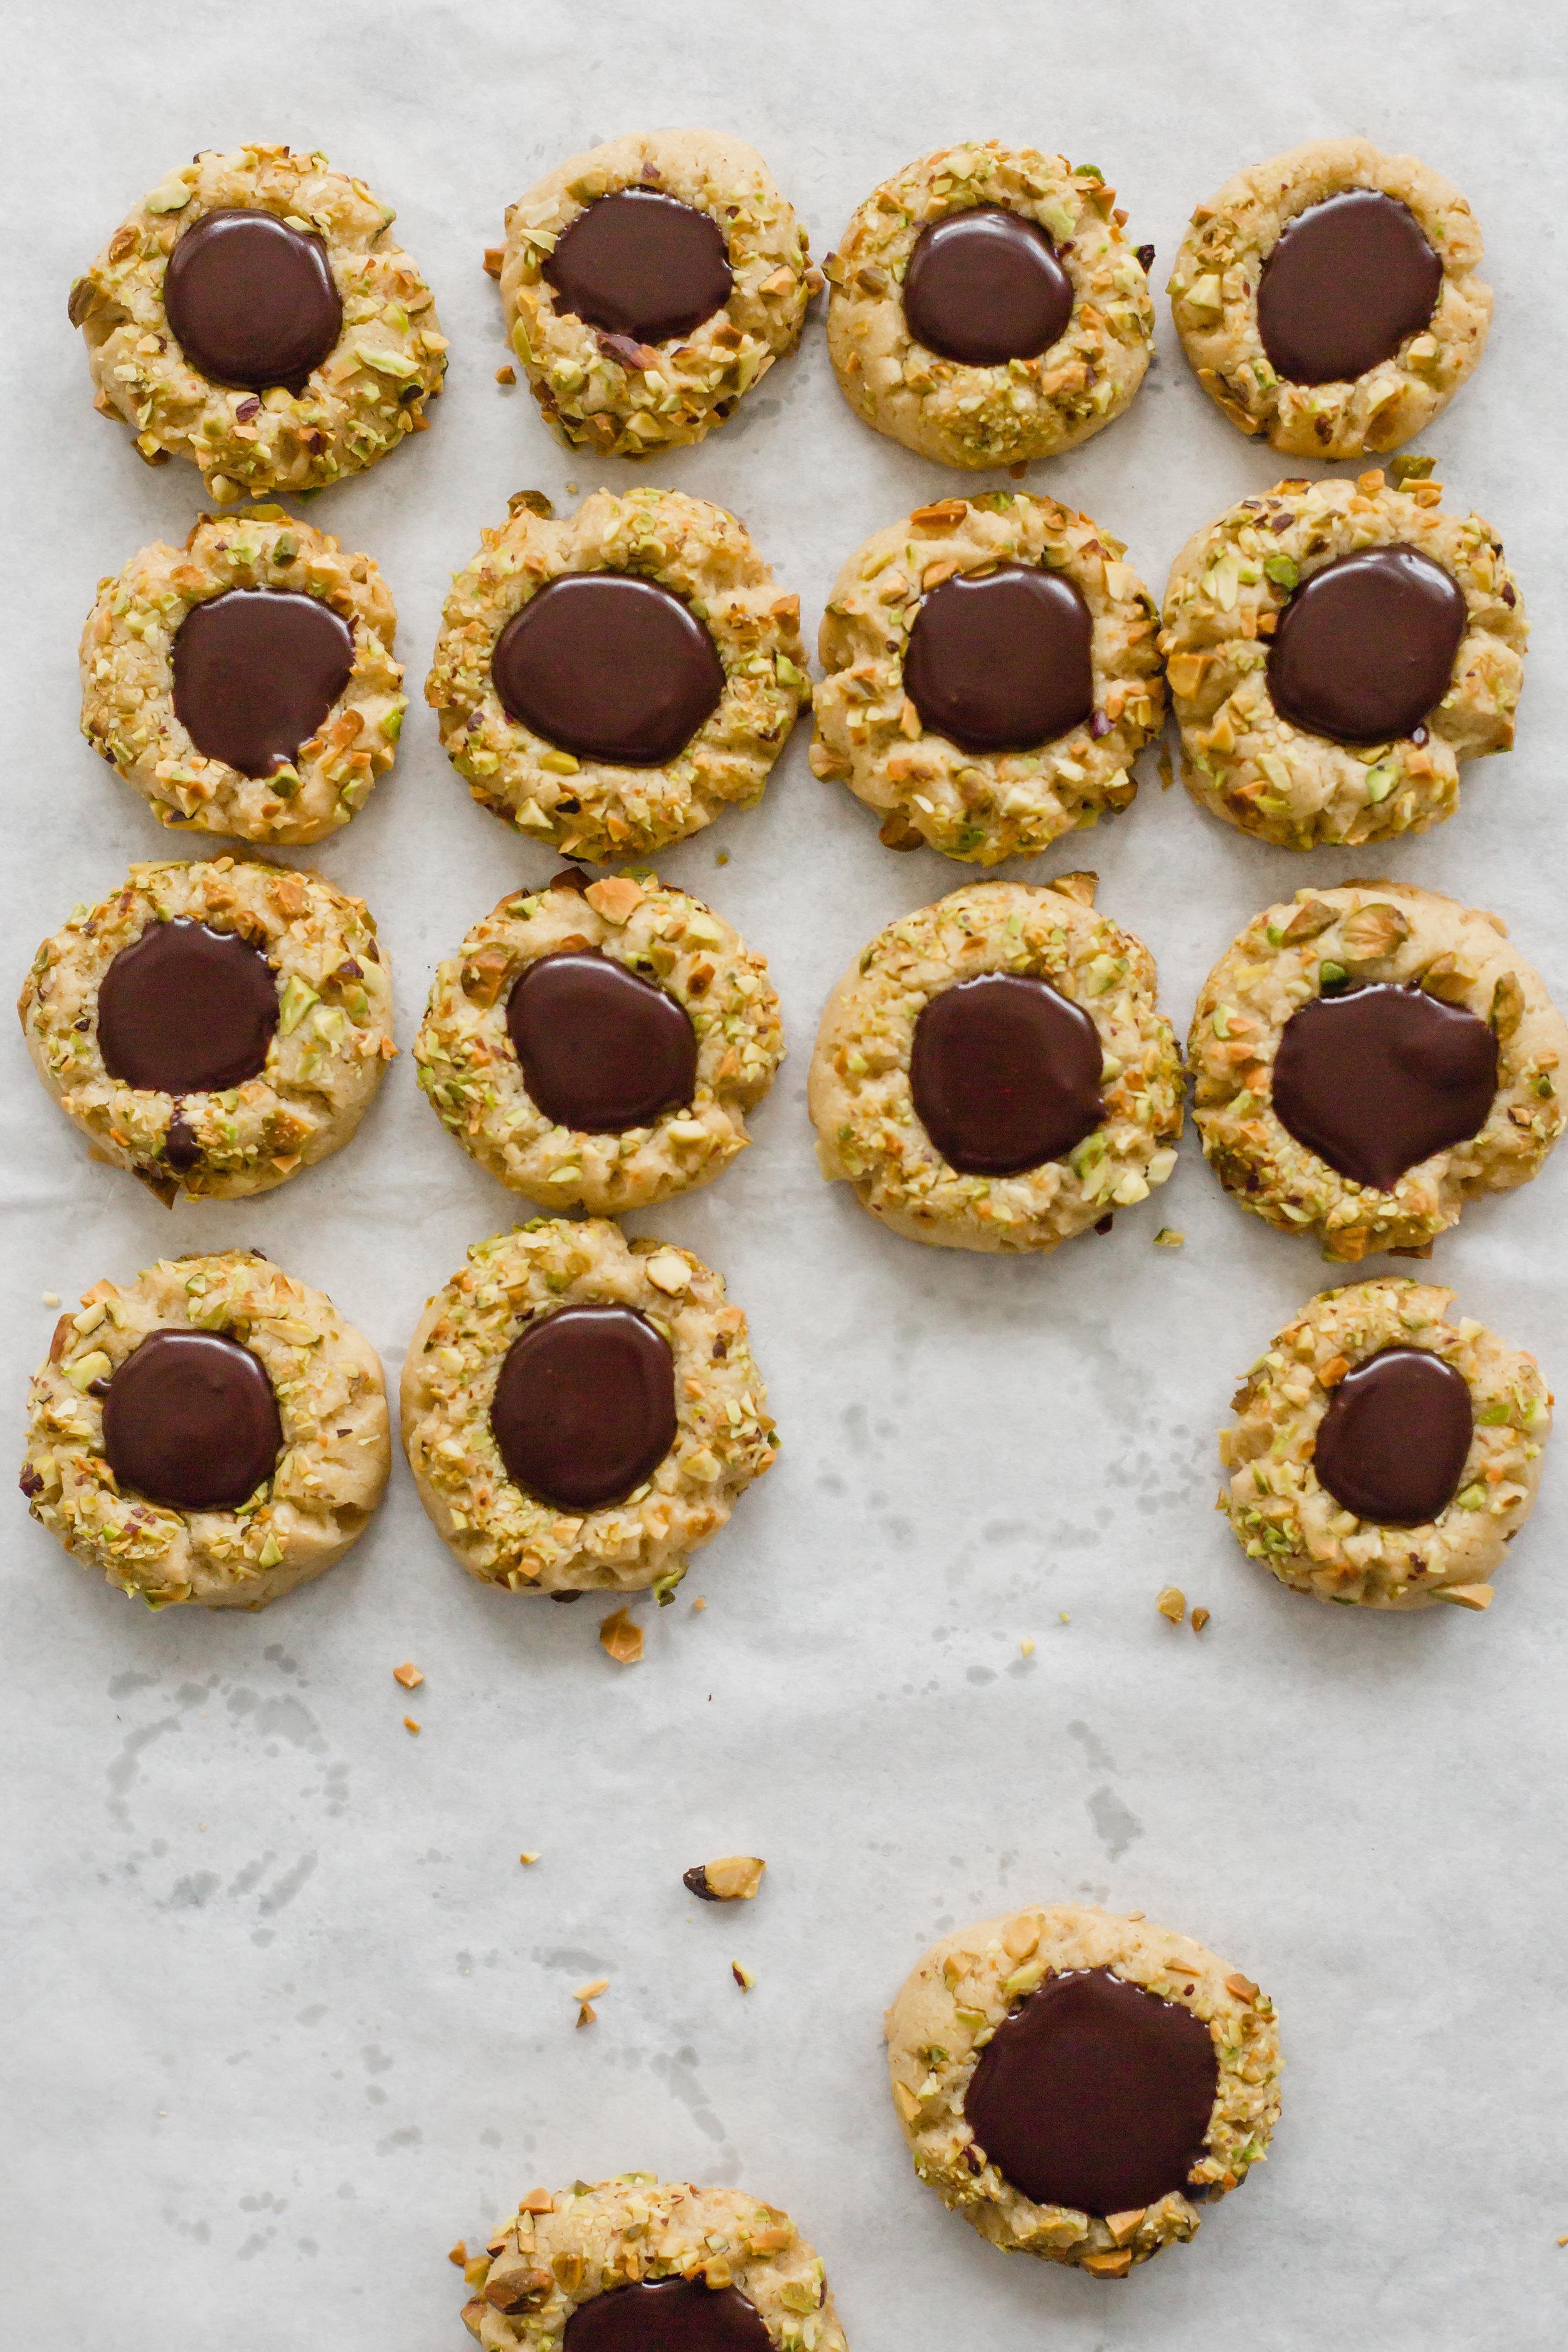 pistachio_chocolate_thumbprints-14.jpg